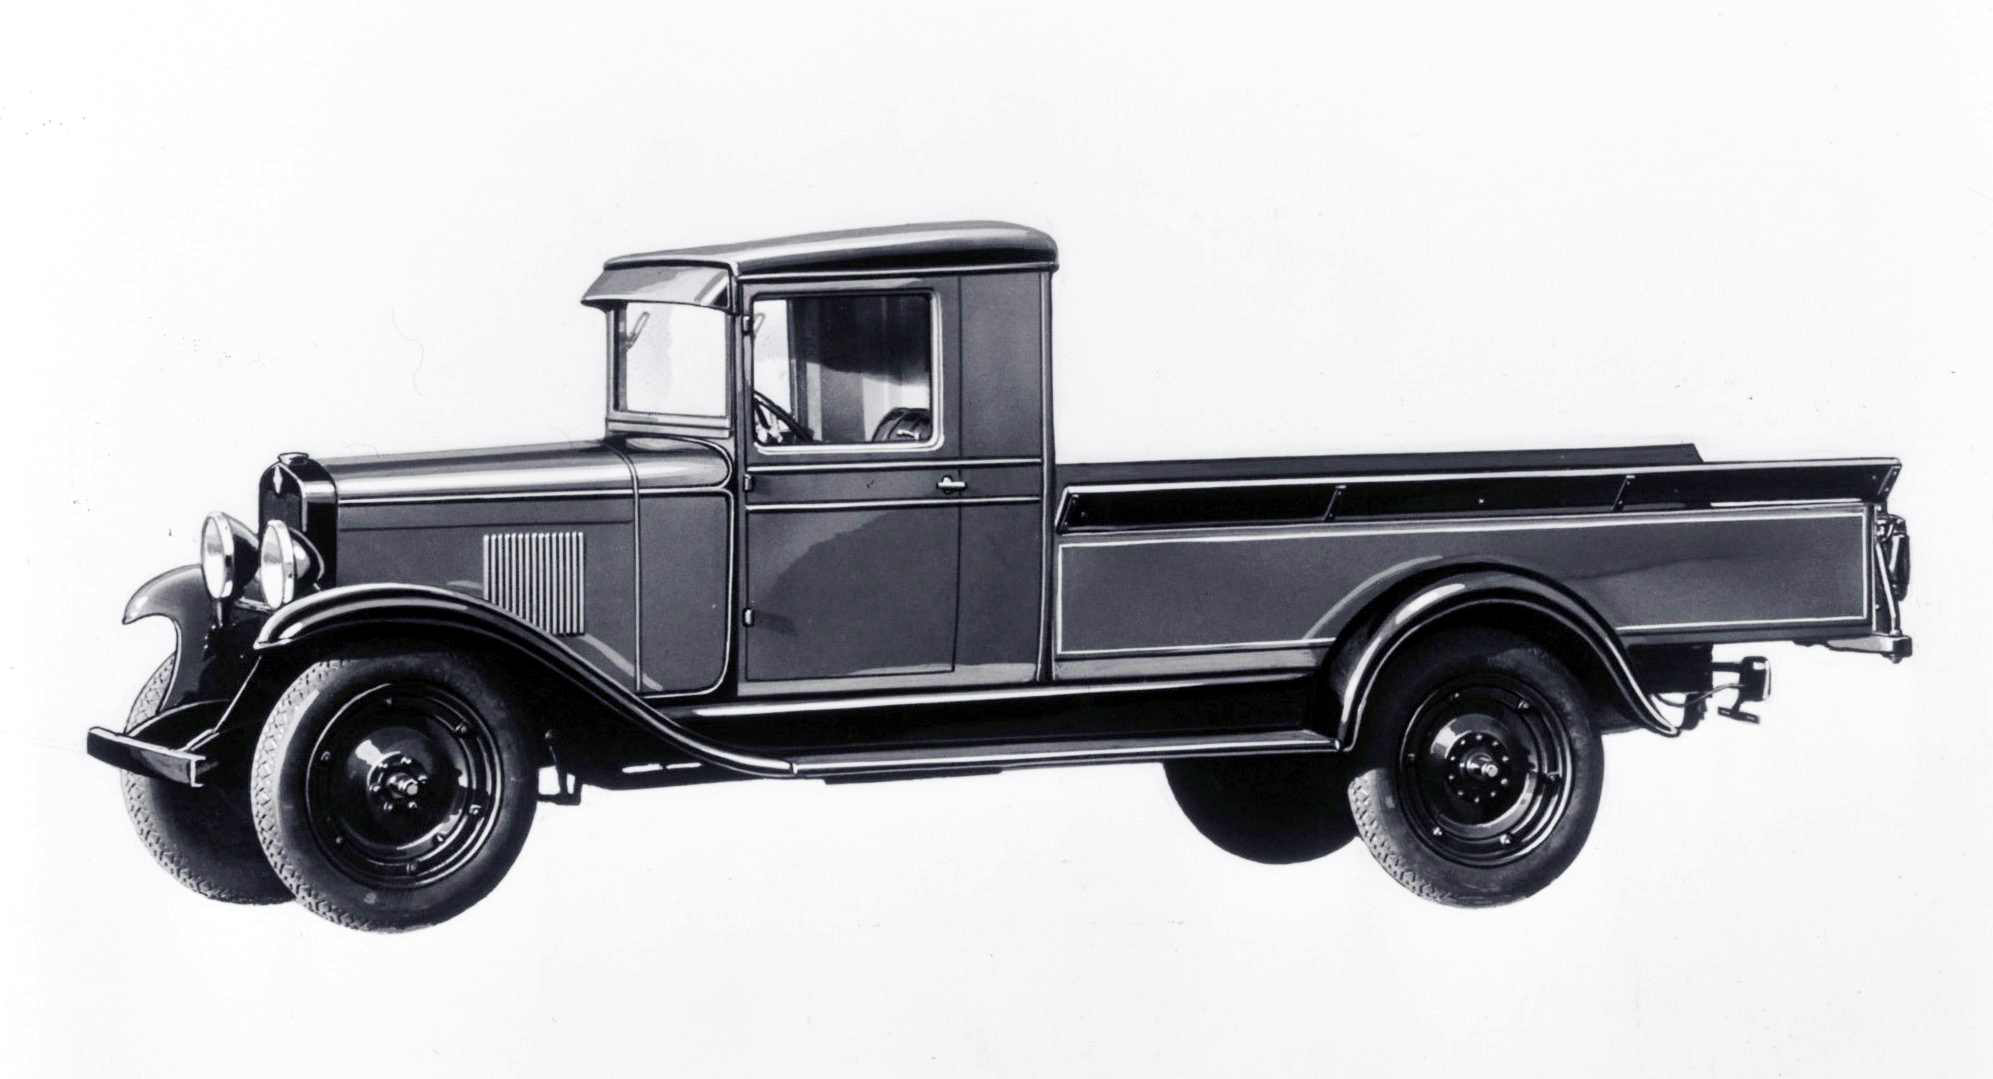 Chevy Truck's 100 year evolution of torque | Medium Duty